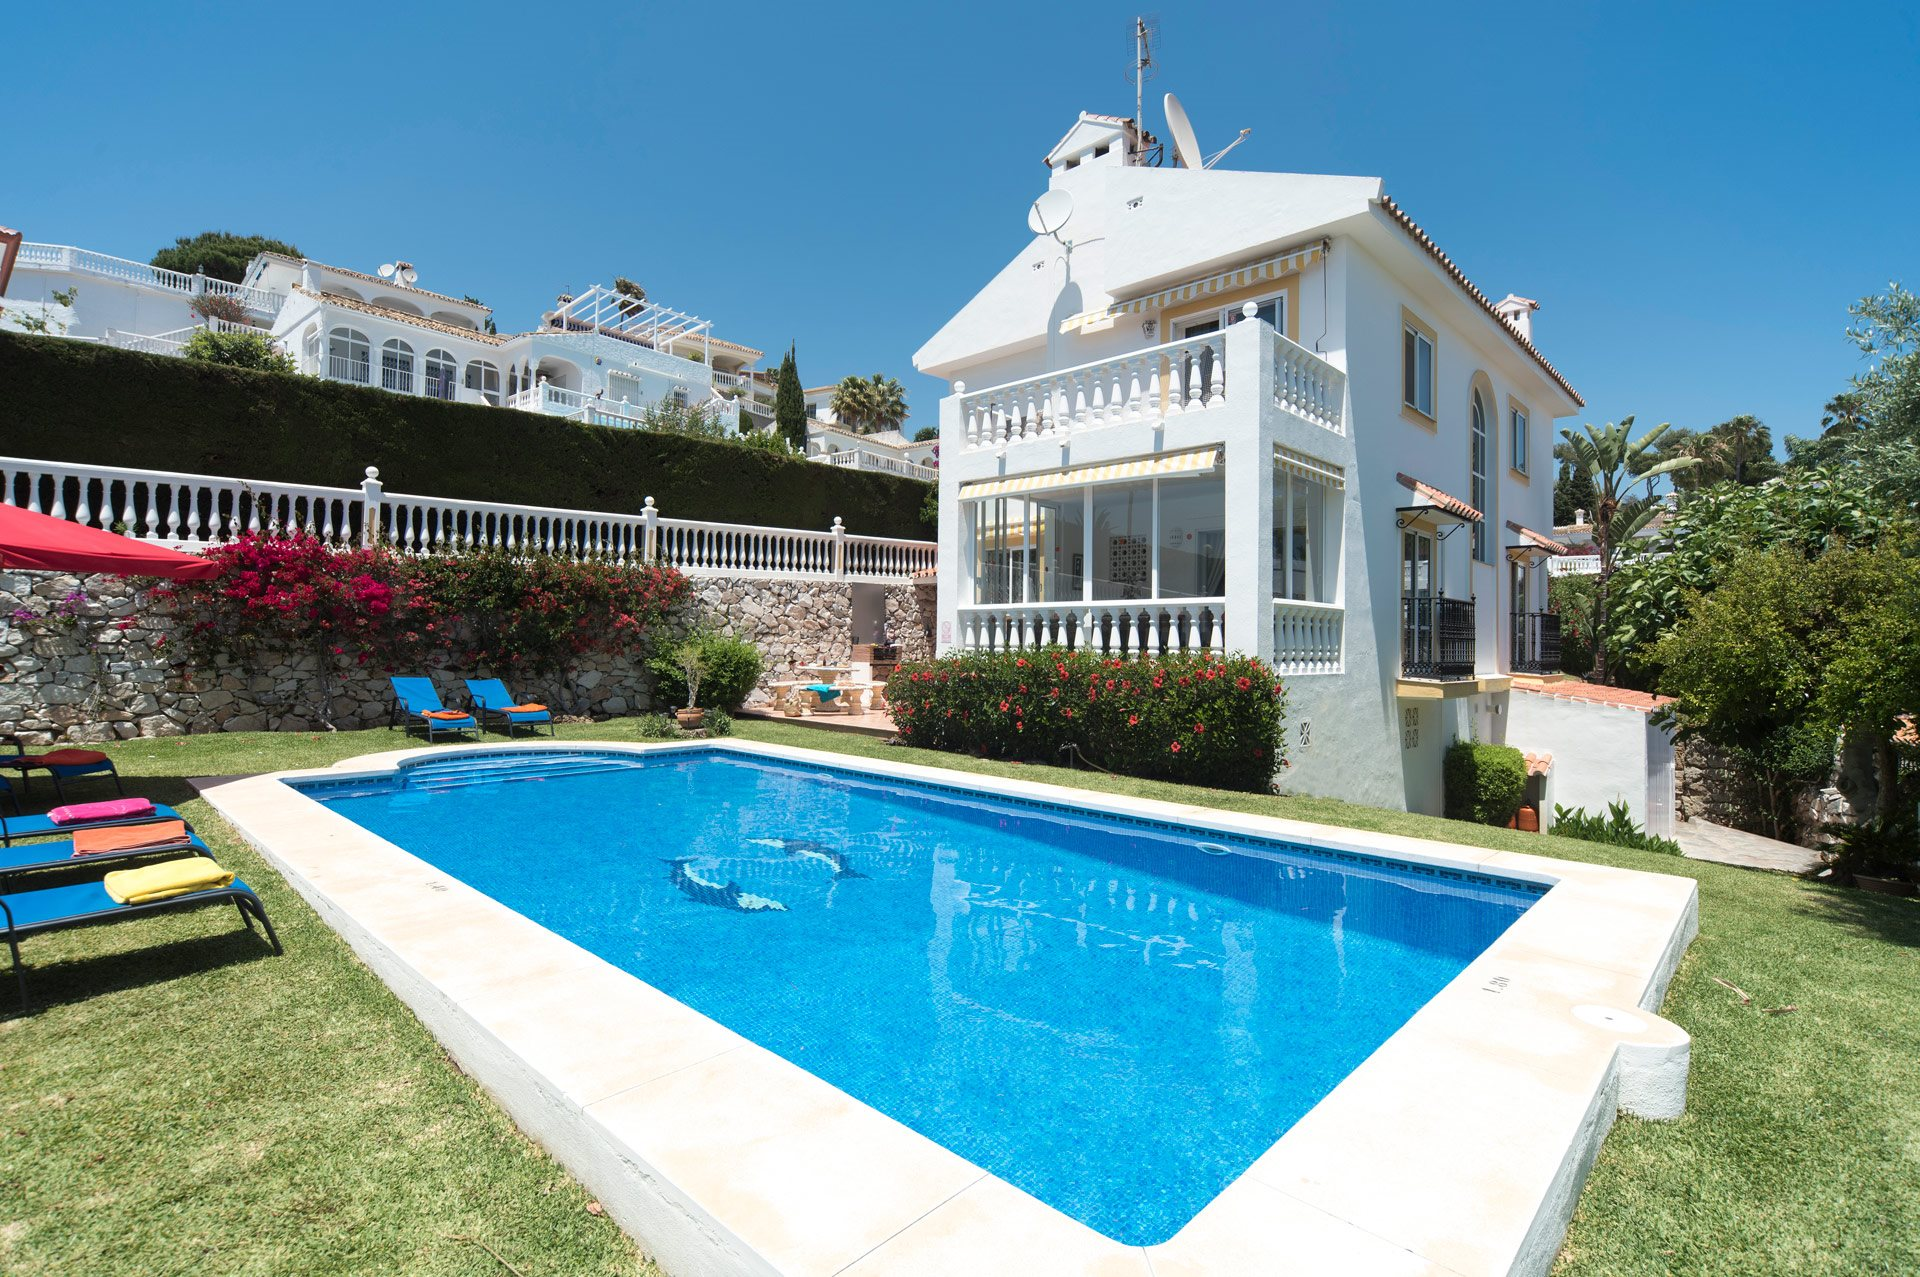 Villa Rincon Riviera, Mijas Costa, Costa del Sol, Spain